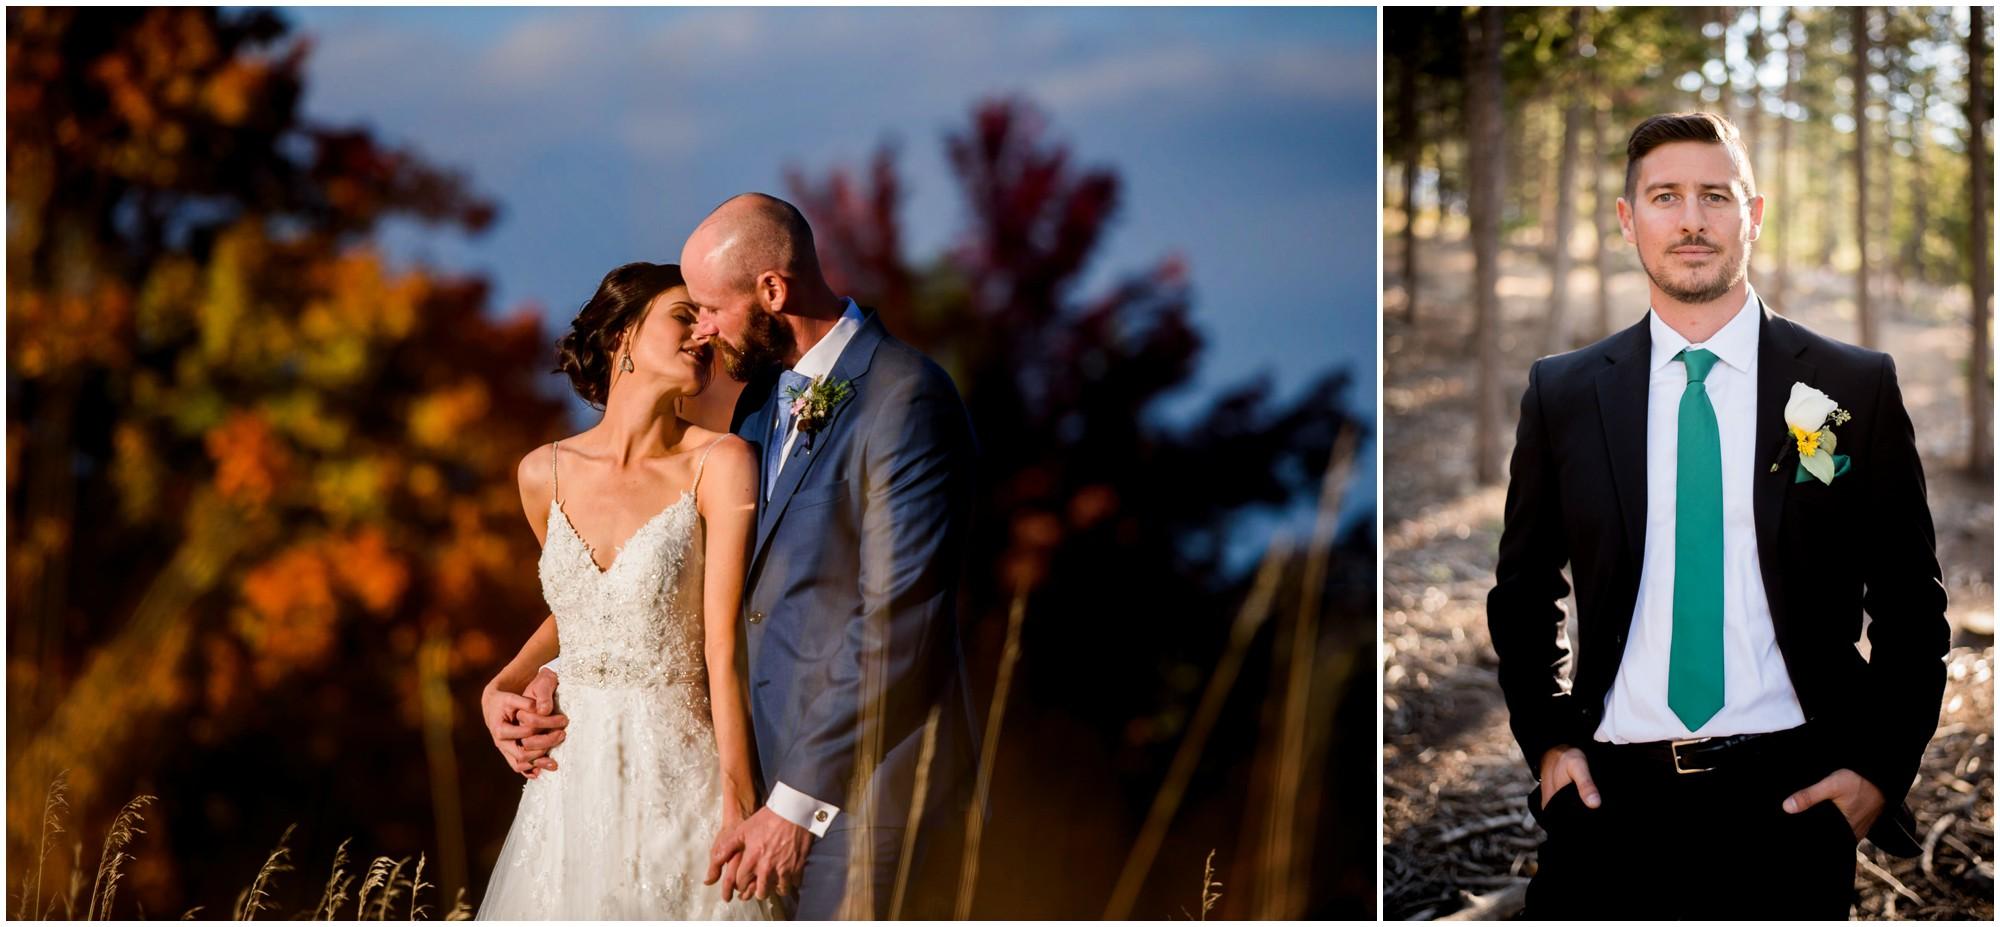 780-Boulder-Colorado-Fall-wedding-photography-king.jpg